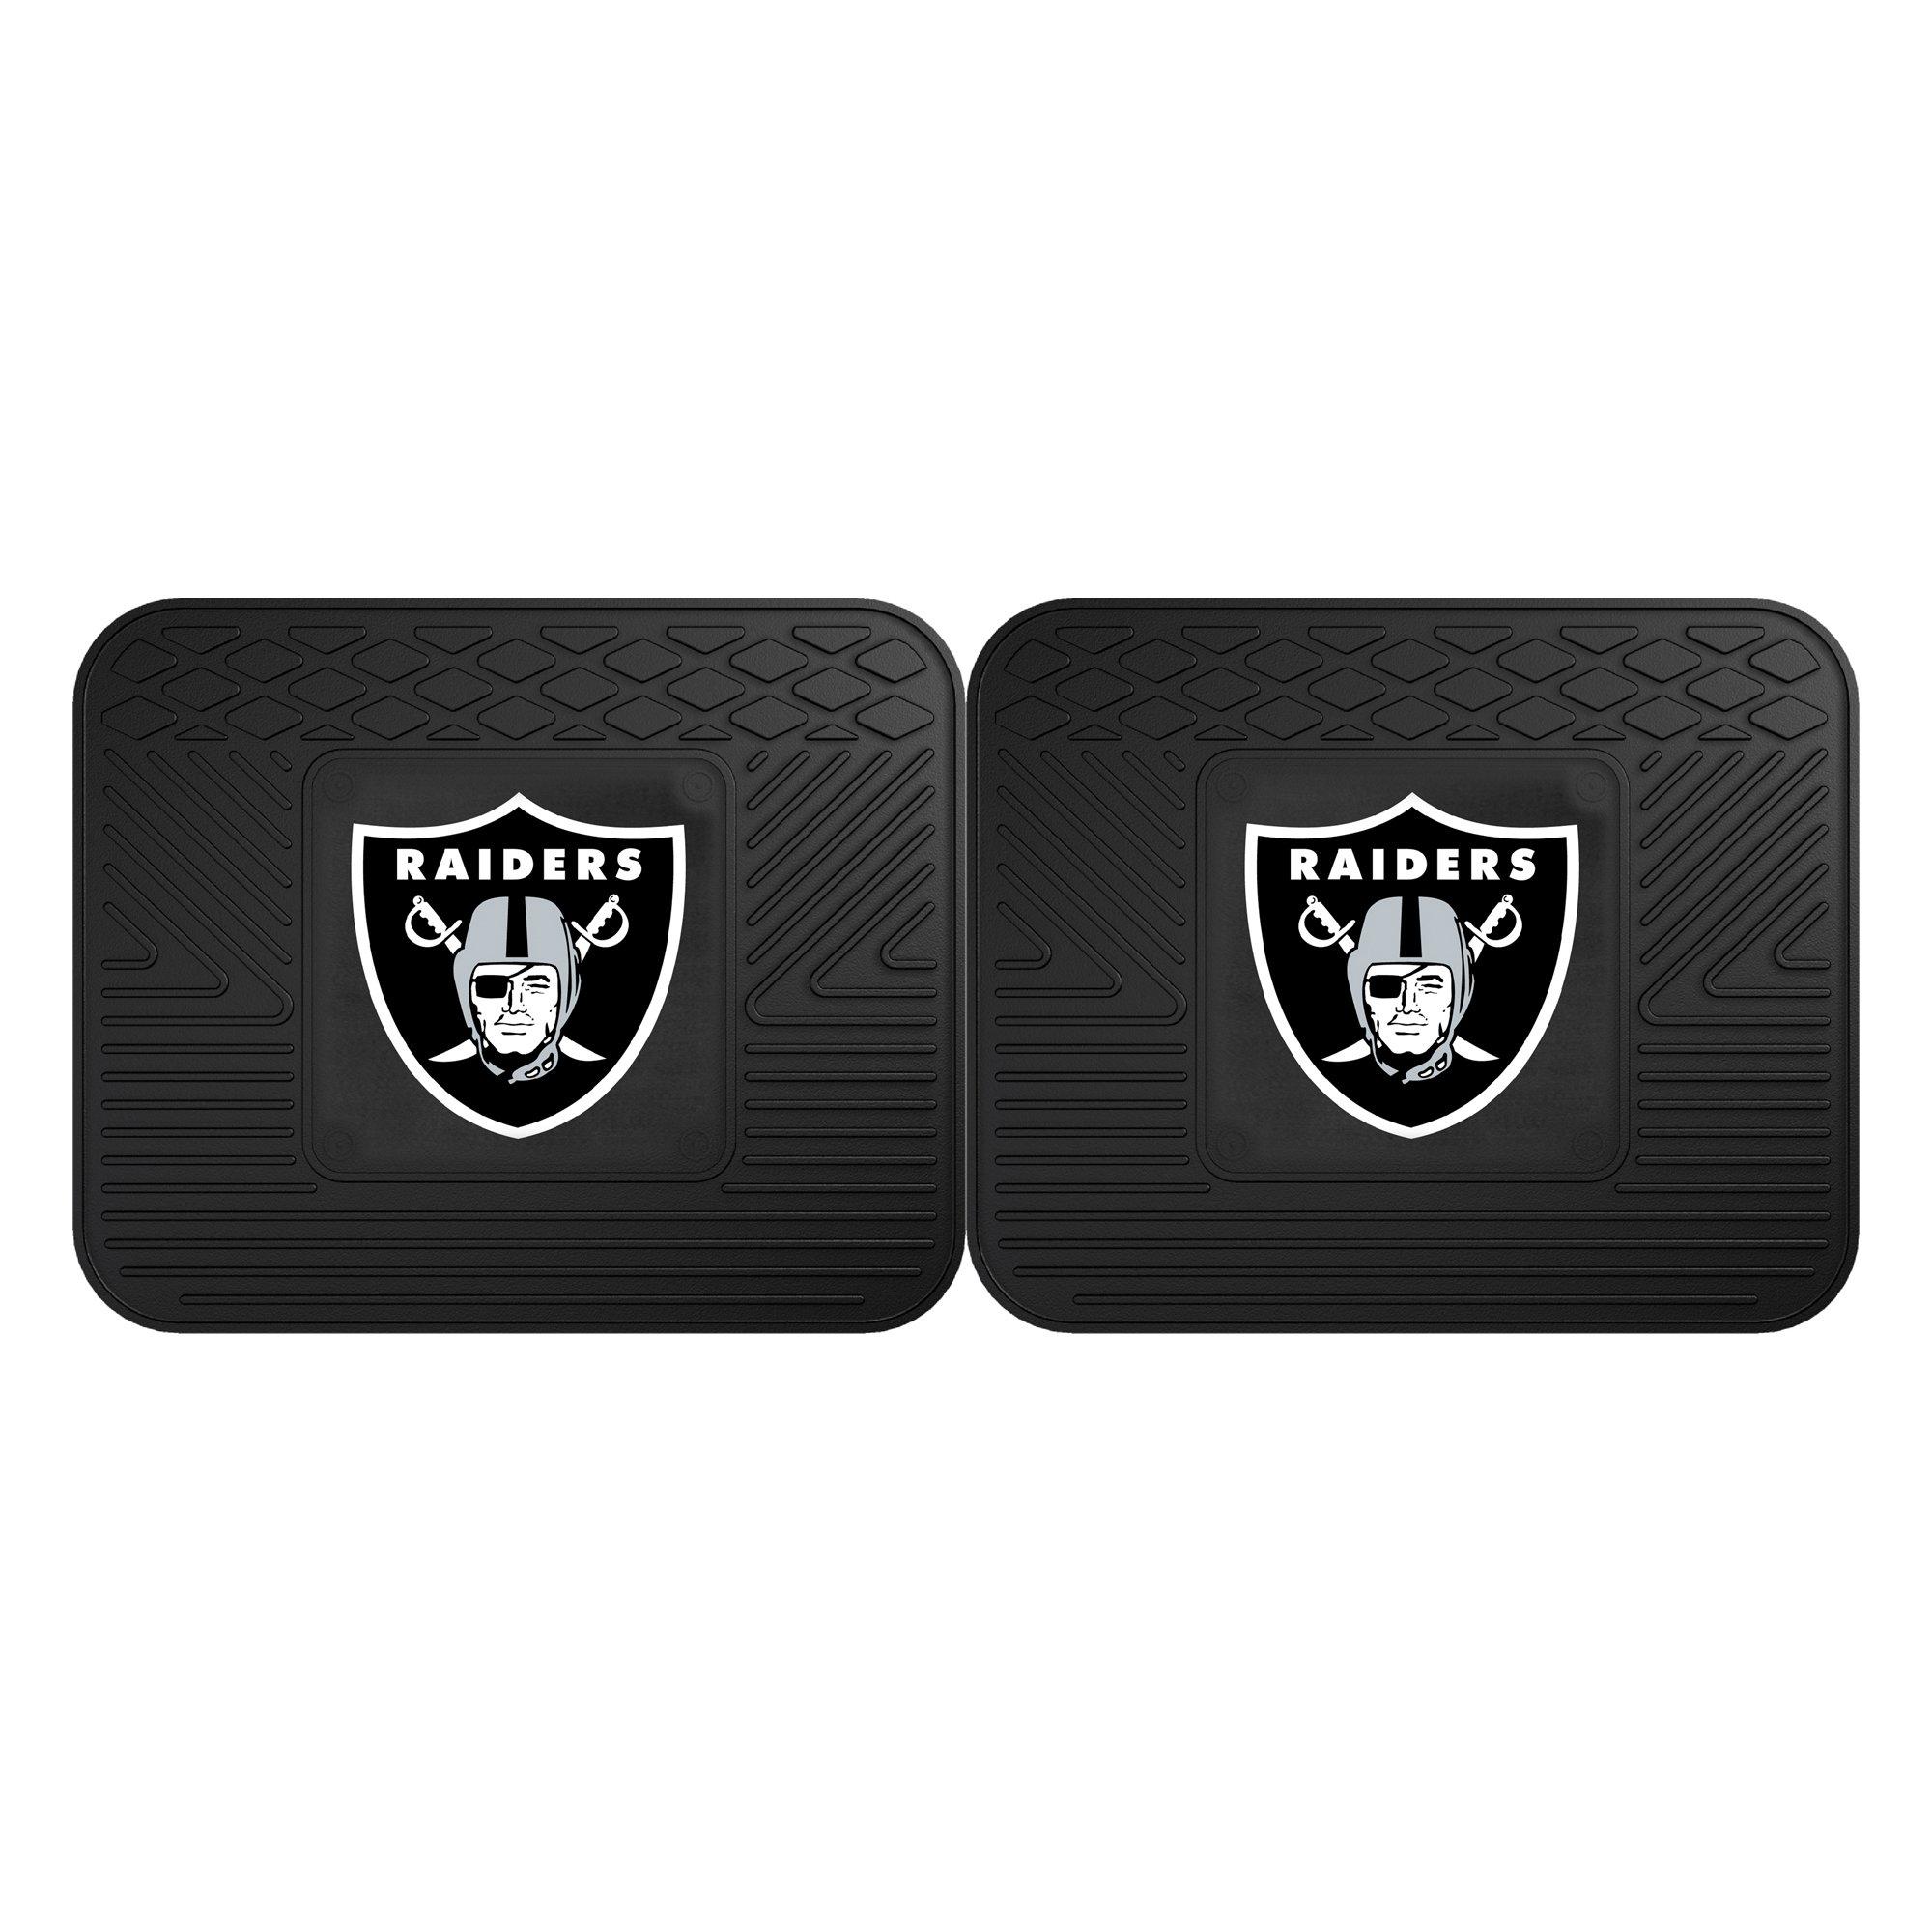 Fanmats 12318 NFL - Oakland Raiders Utility Mat - 2 Piece